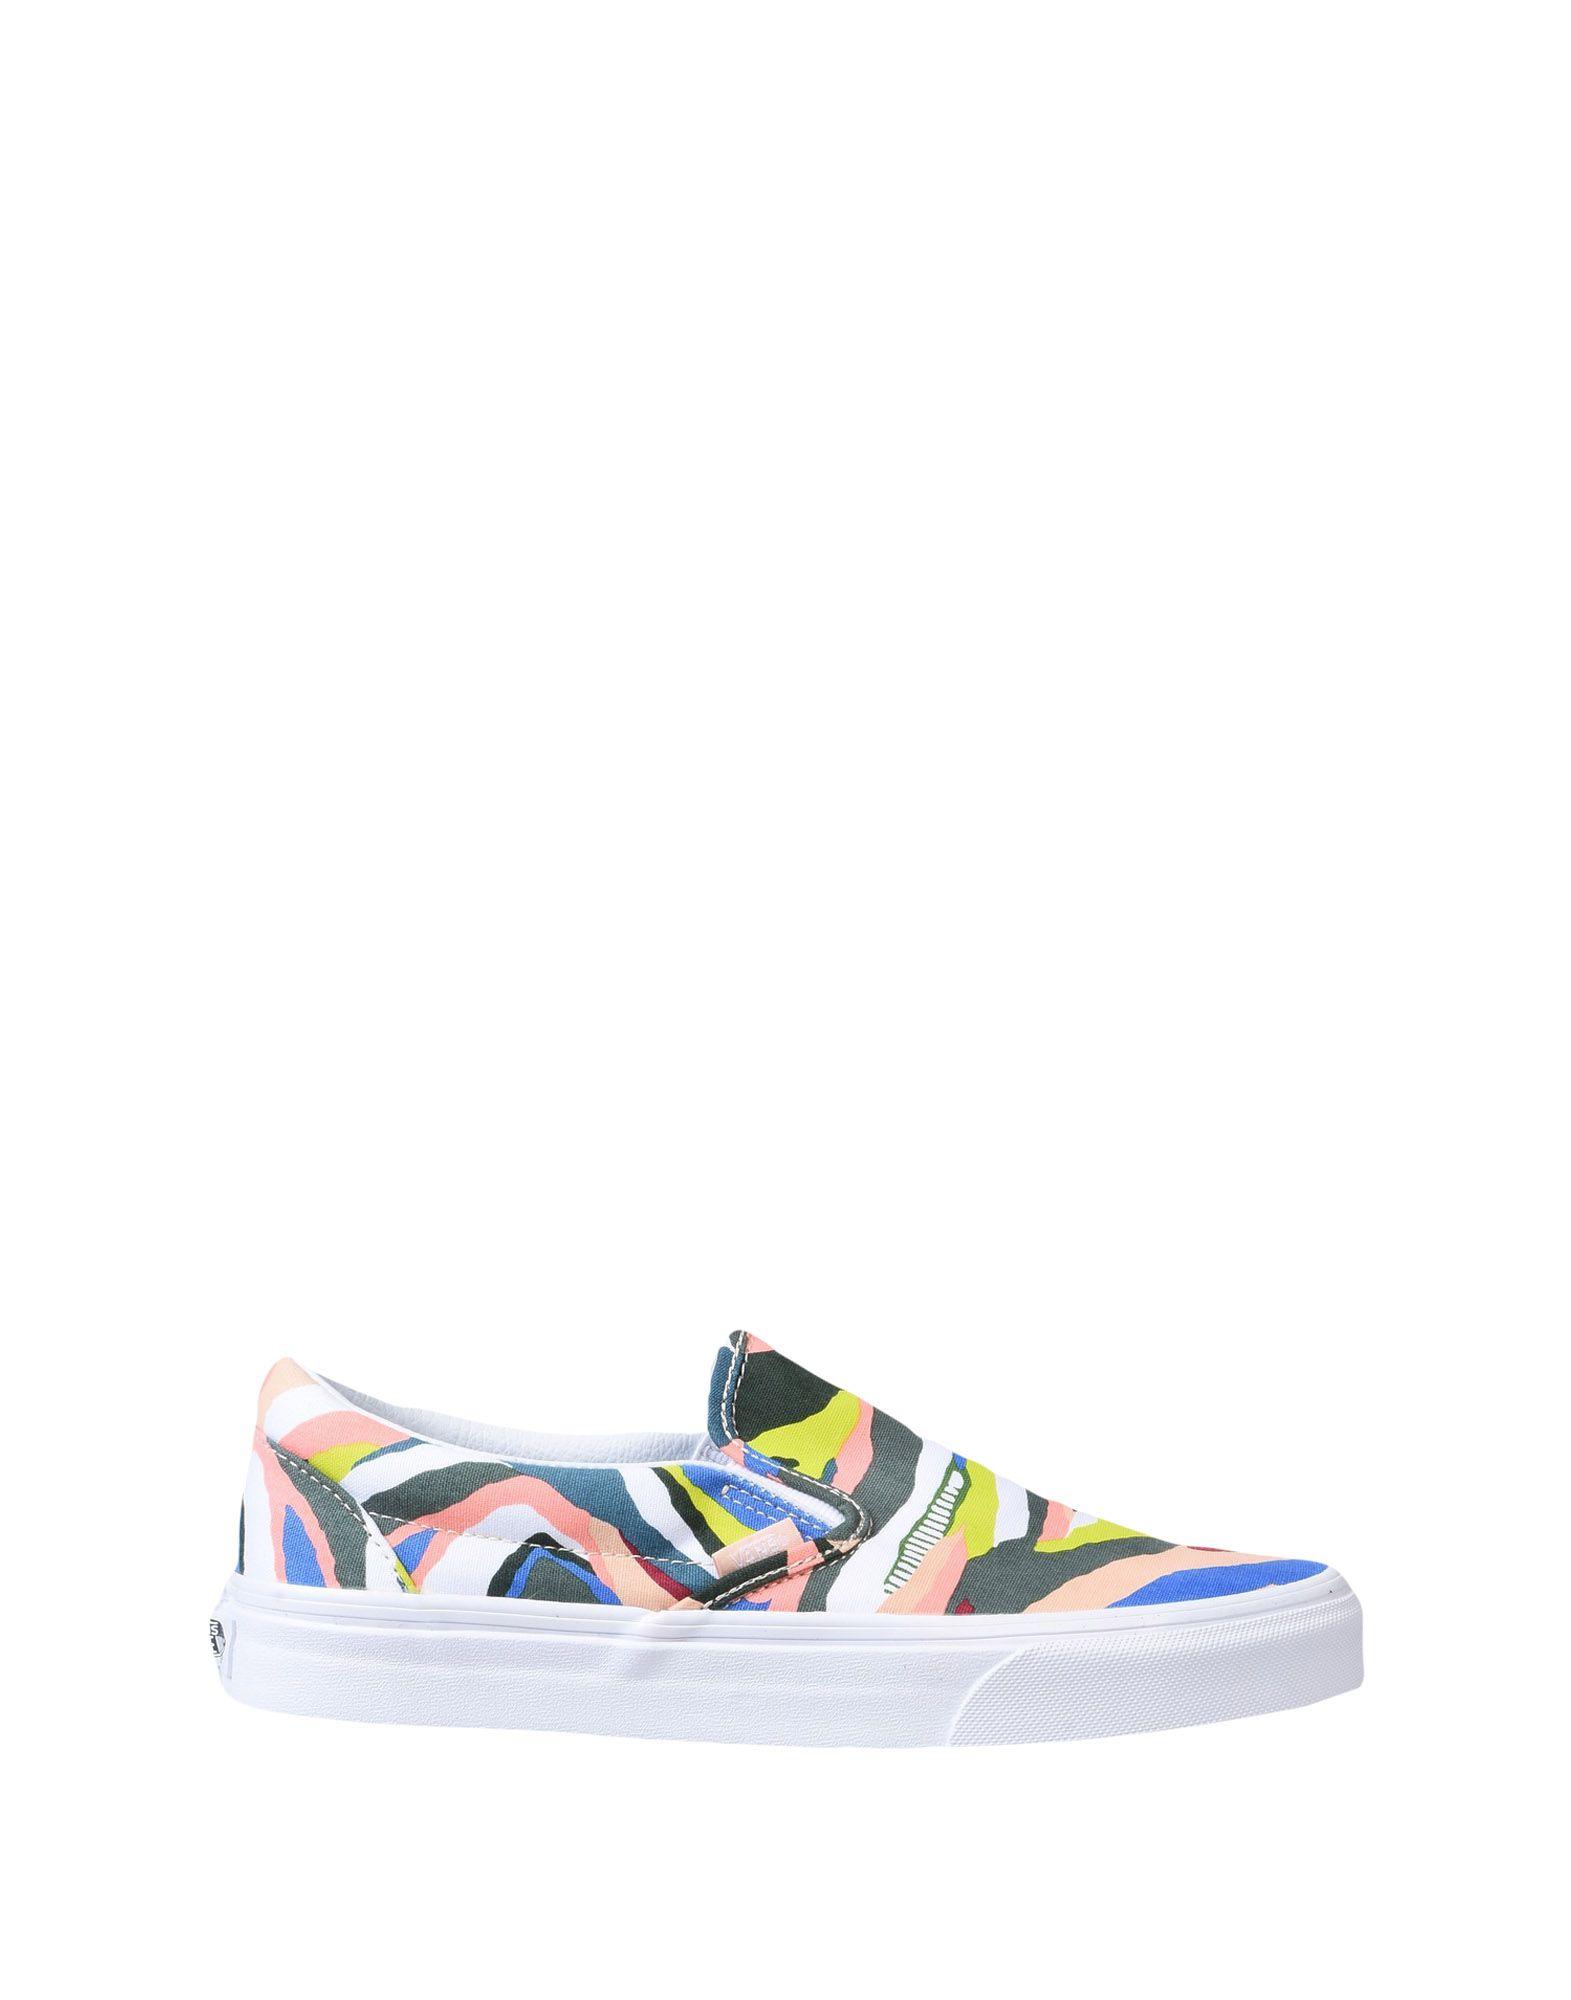 Sneakers Vans Ua Classic Slip-On - Abstract Horizon - Femme - Sneakers Vans sur